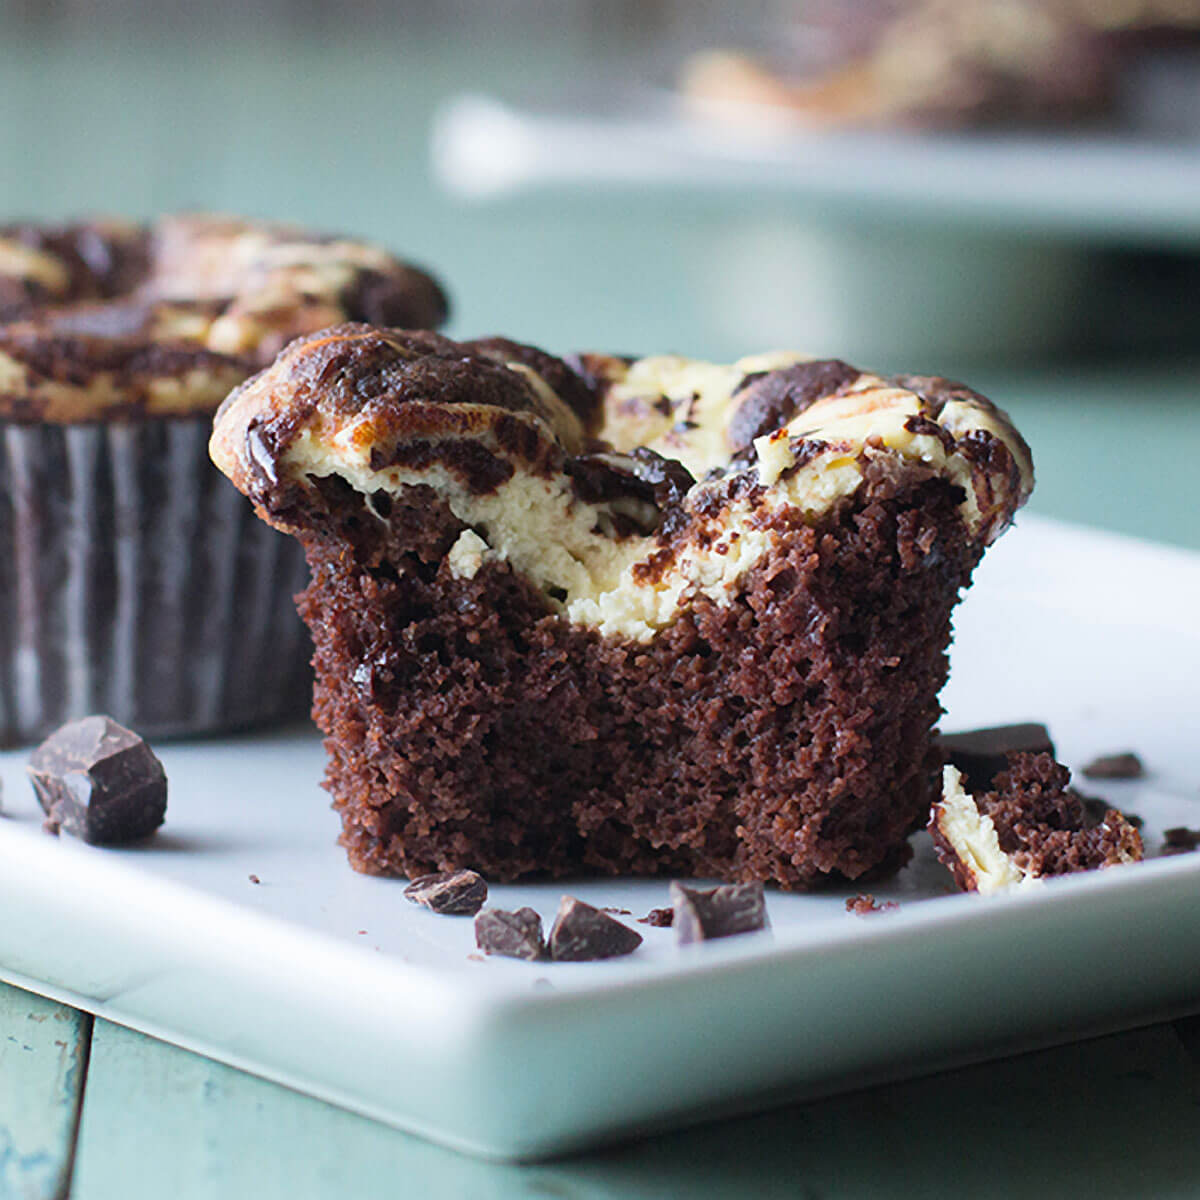 Low-Carb Black Bottom Cupcakes